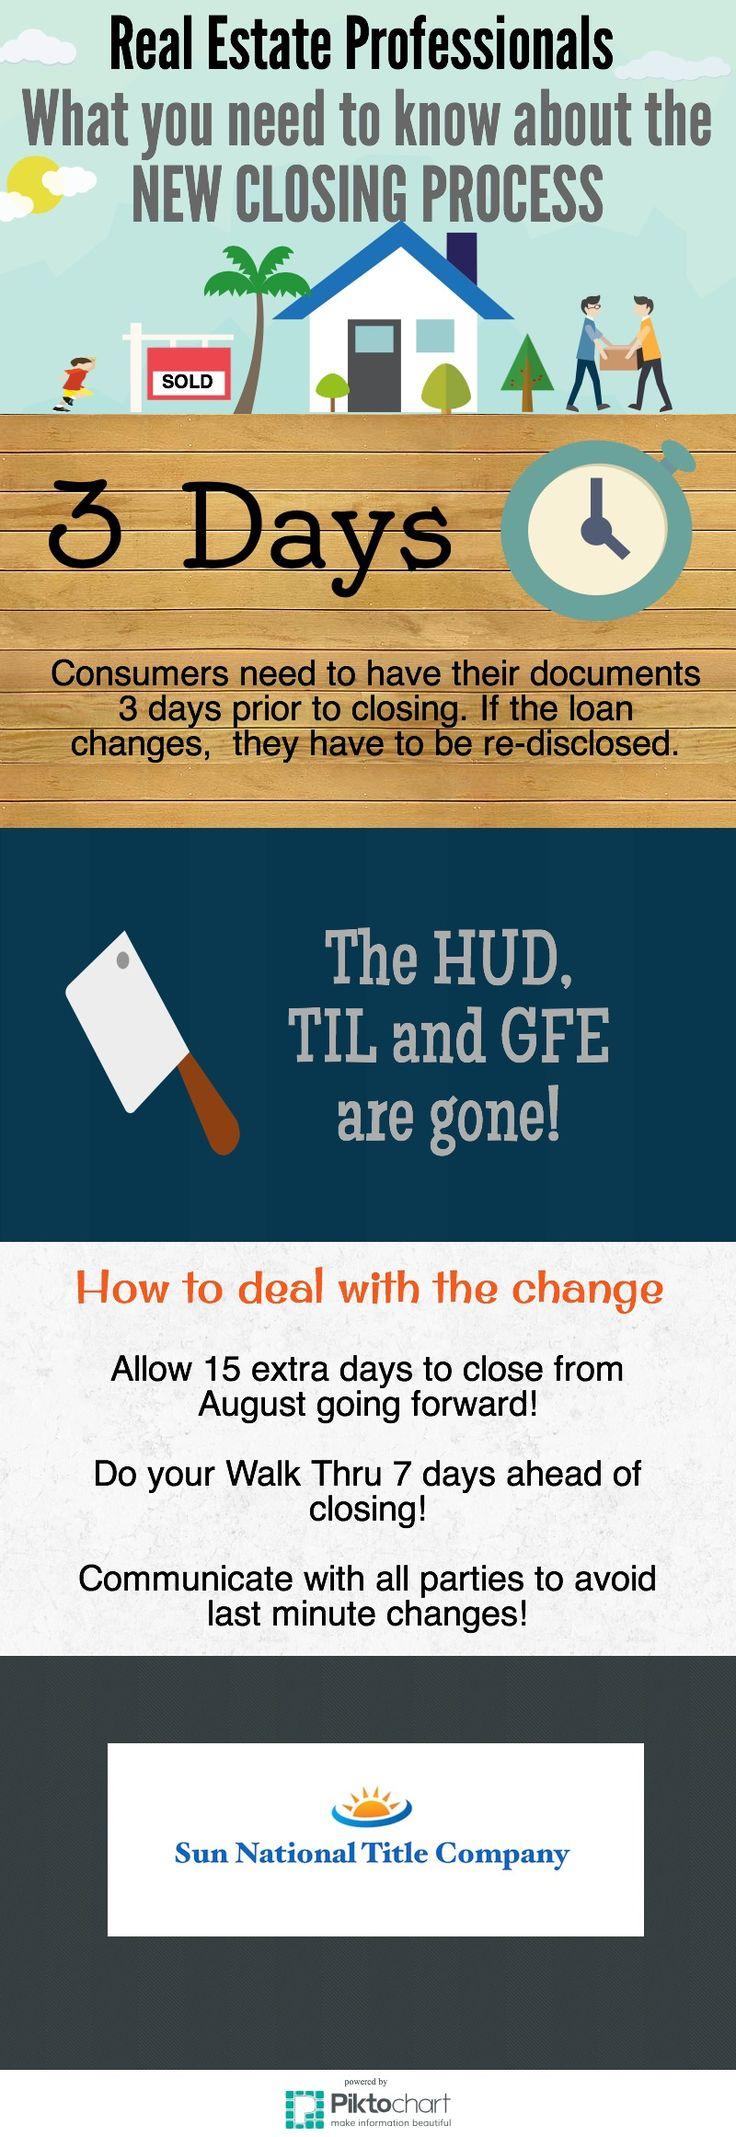 Cape Coral Title Insurance Co Piktochart Infographic